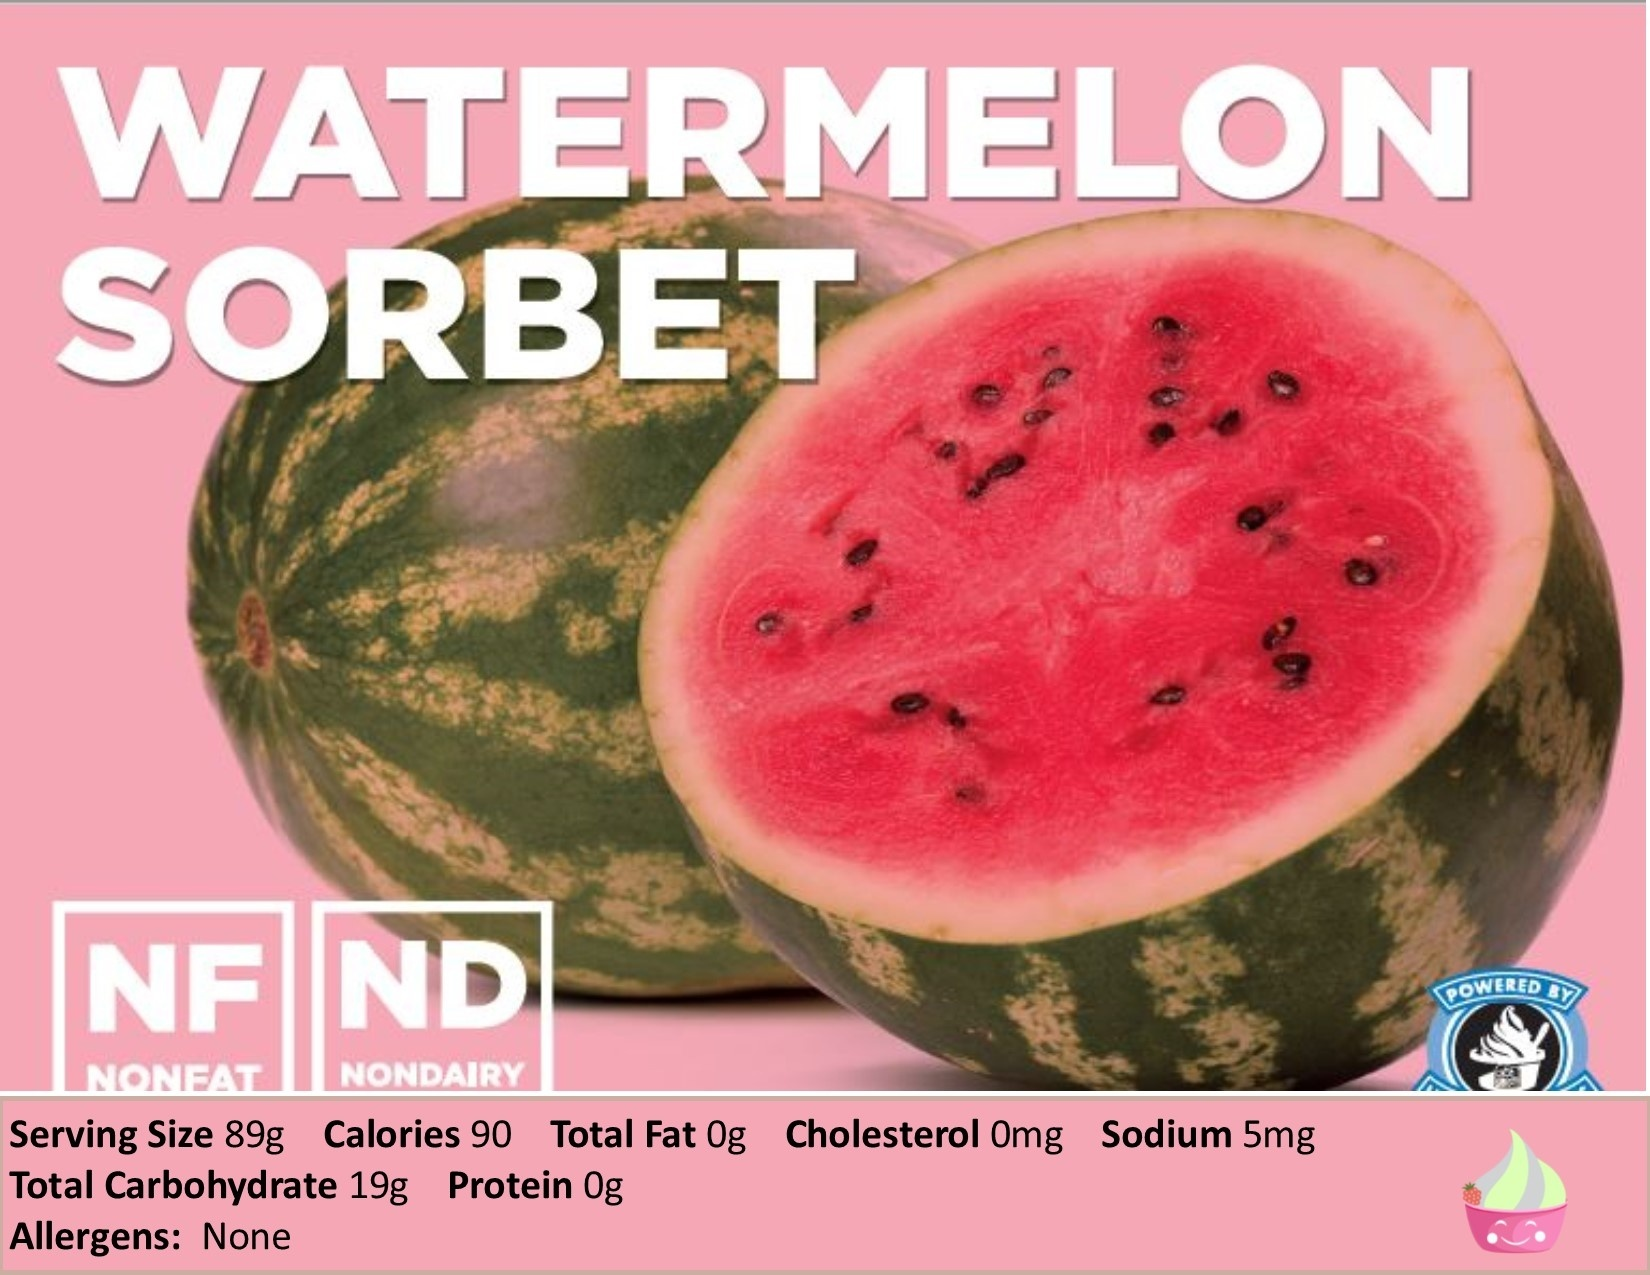 https://0201.nccdn.net/1_2/000/000/0f1/fd4/Watermelon-Sorbet-1650x1275-1650x1275.jpg